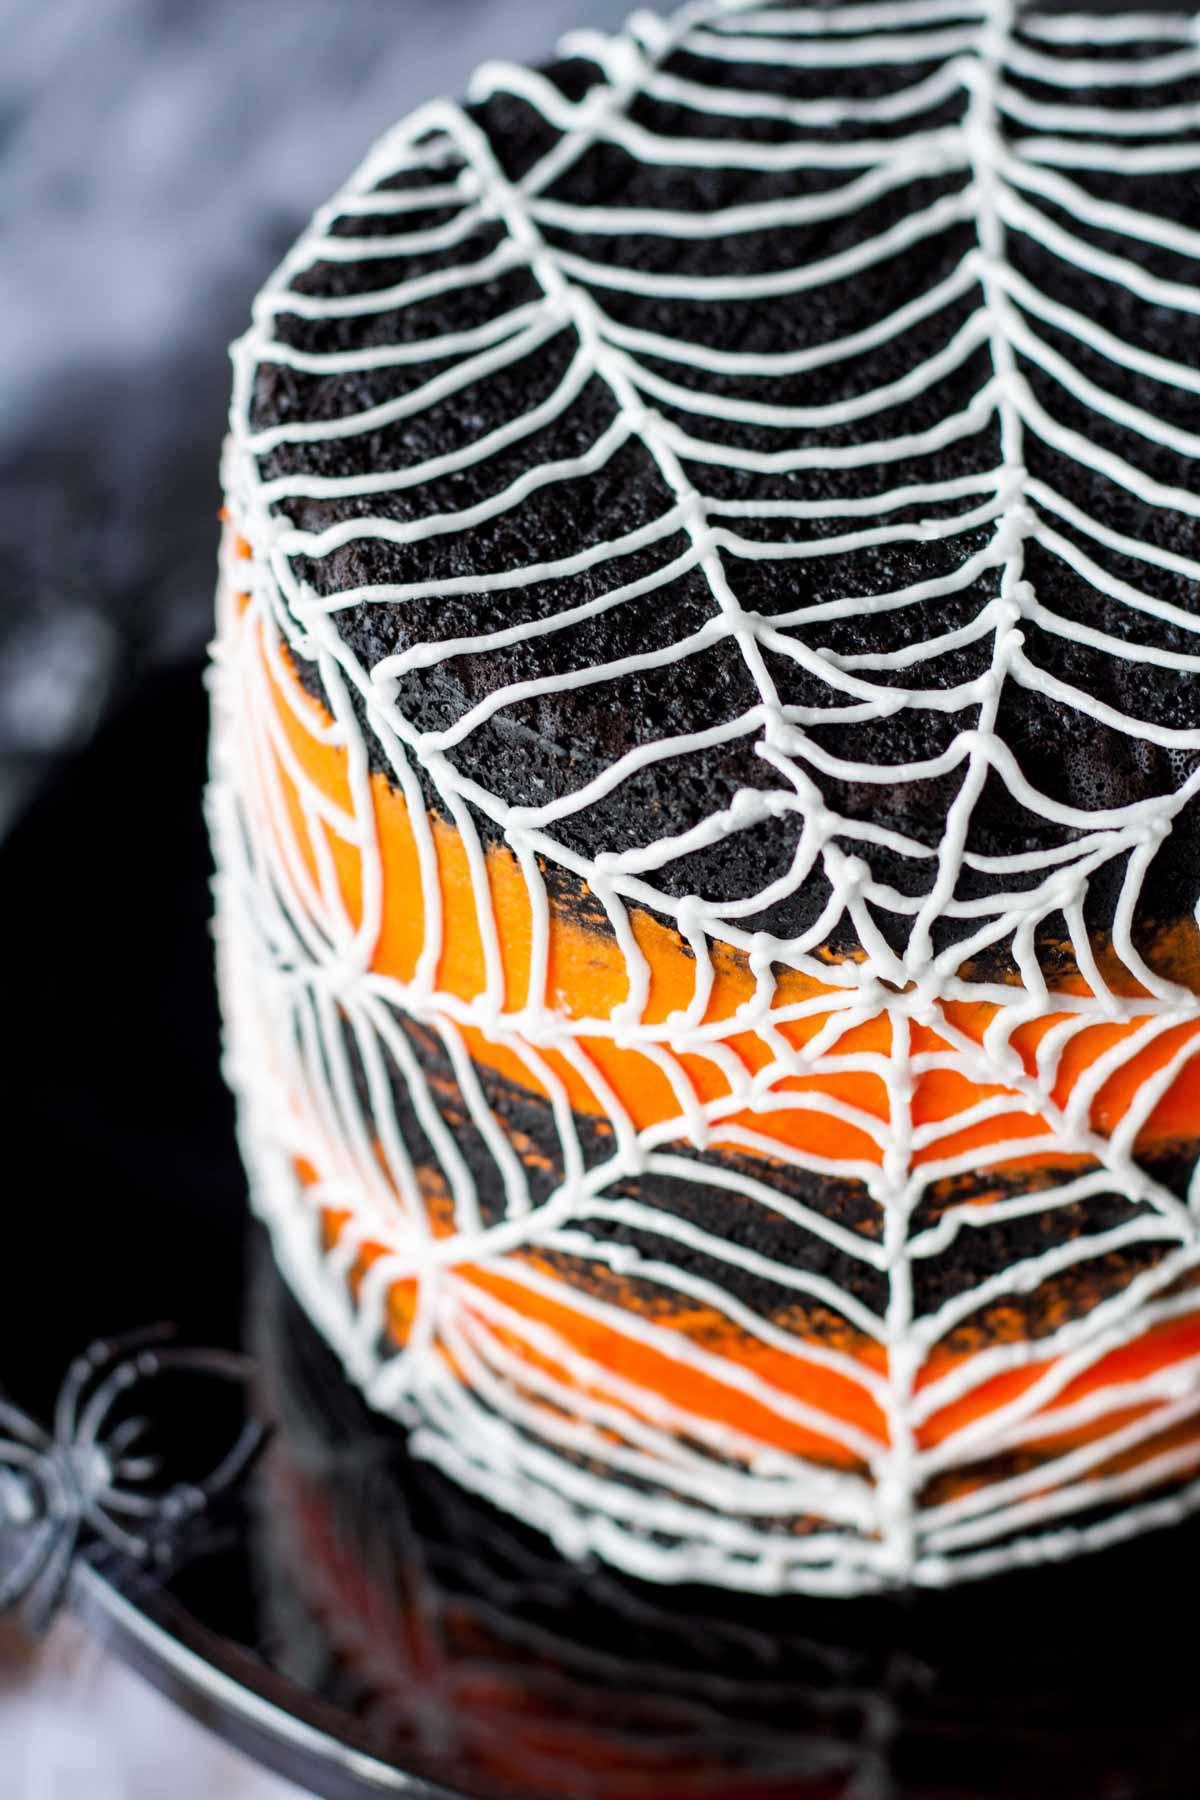 Spiderweb Cake - Liv for Cake